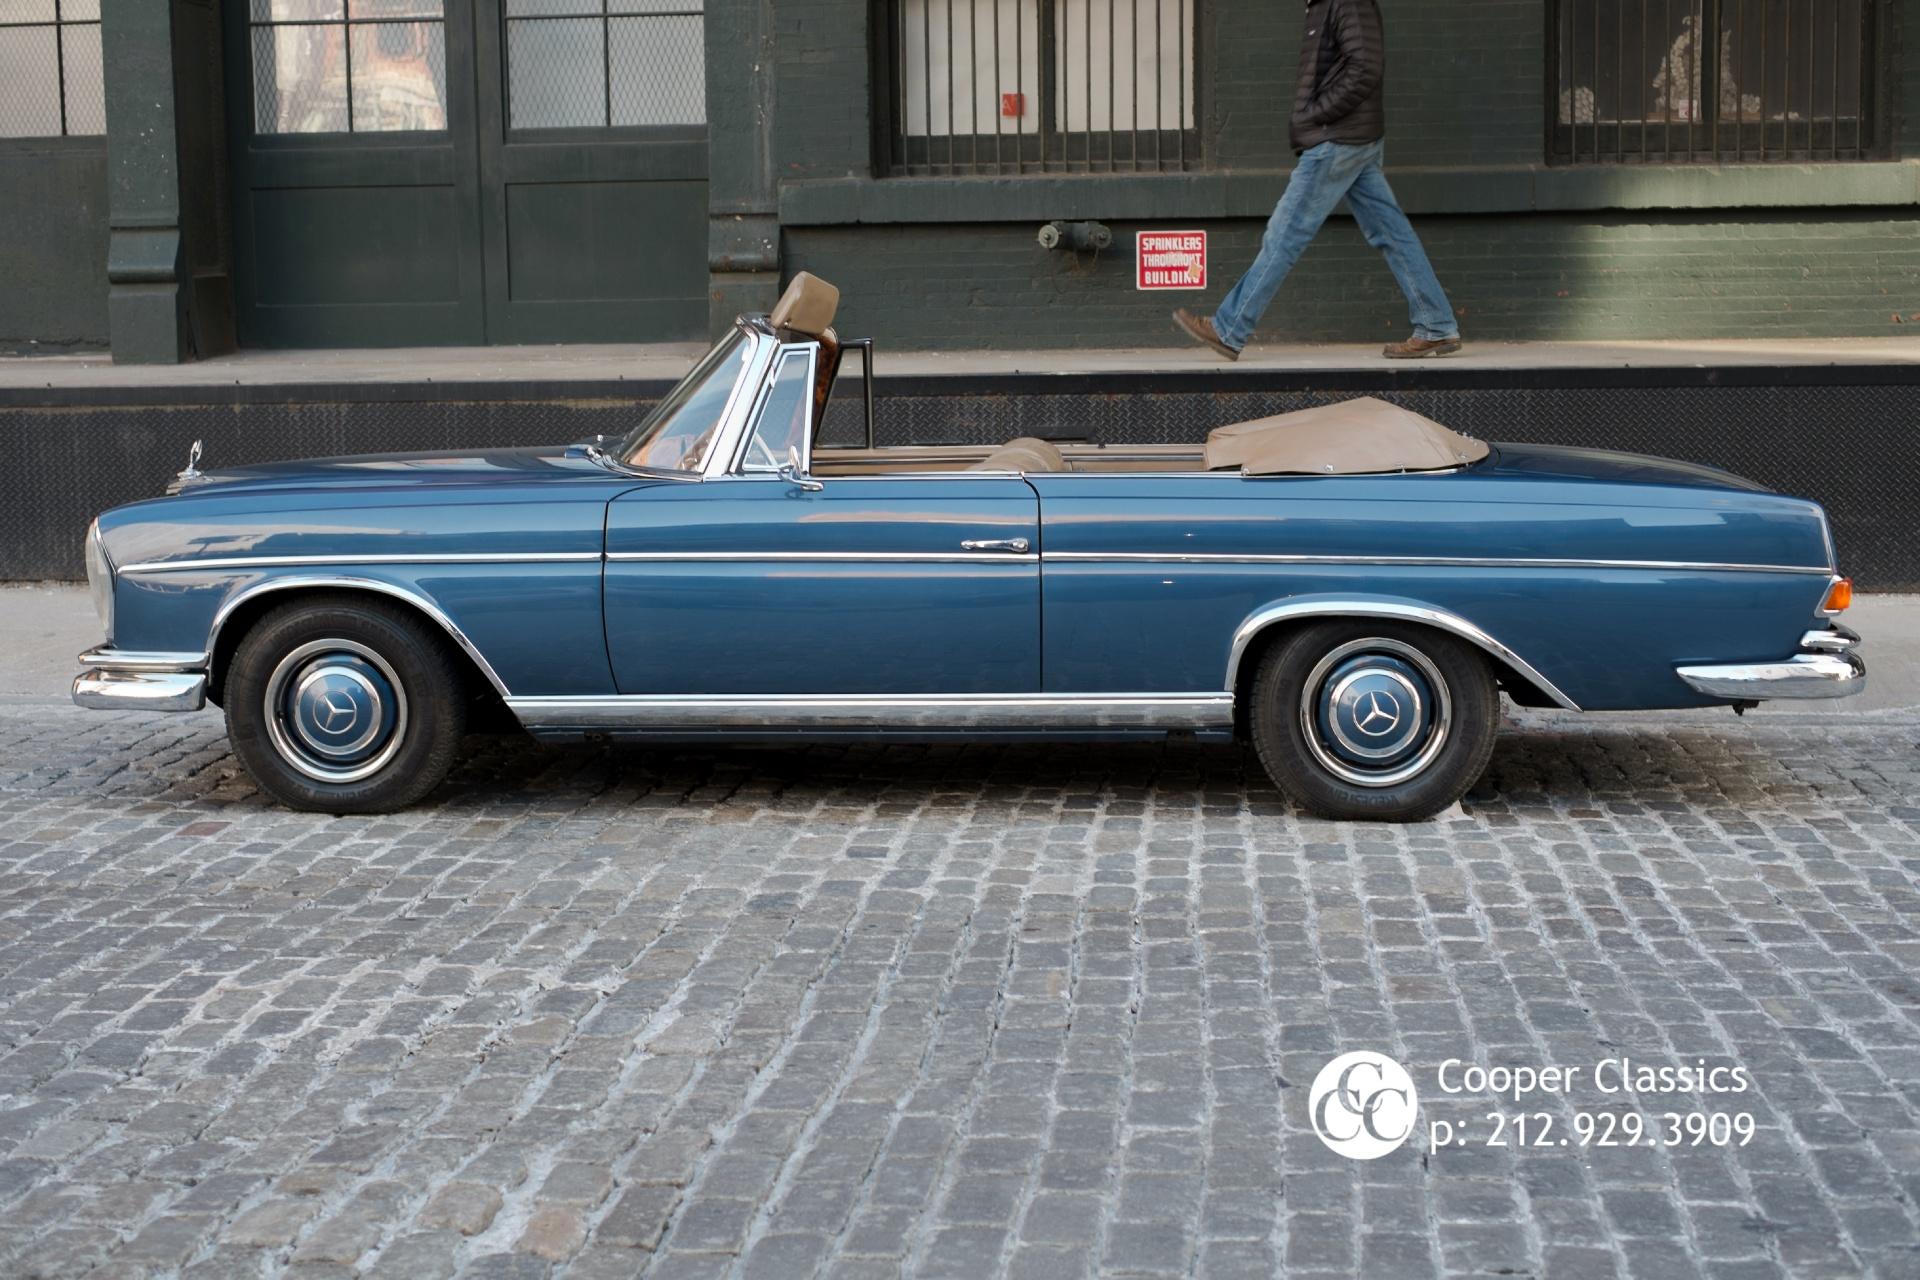 Buy Used Cars Frankfurt Germany